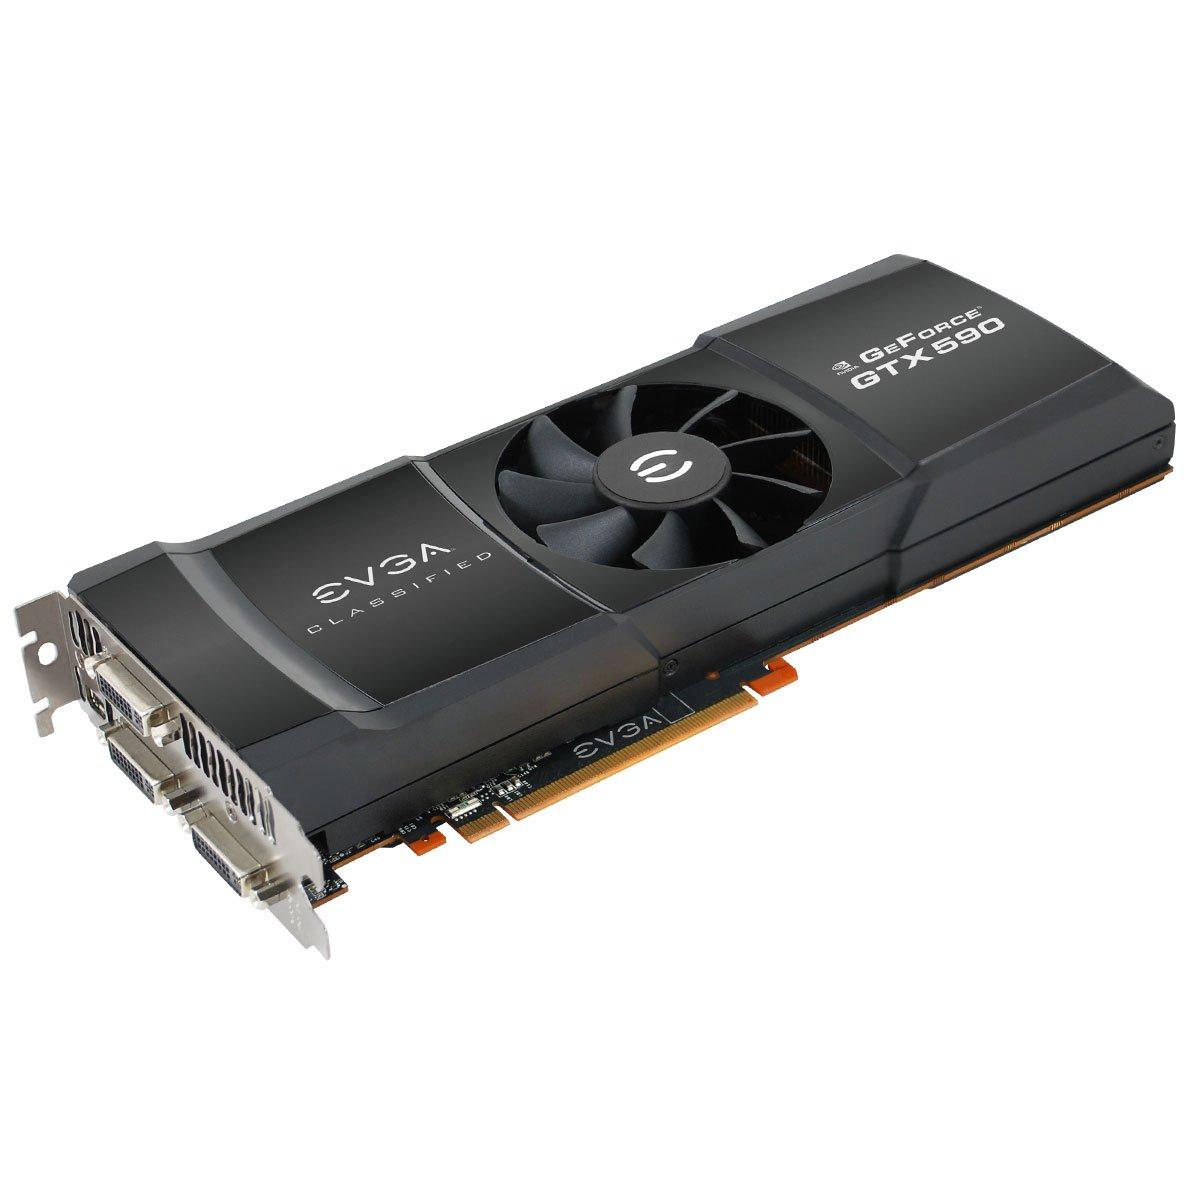 EVGA GeForce GTX 590 Windows 7 64-BIT